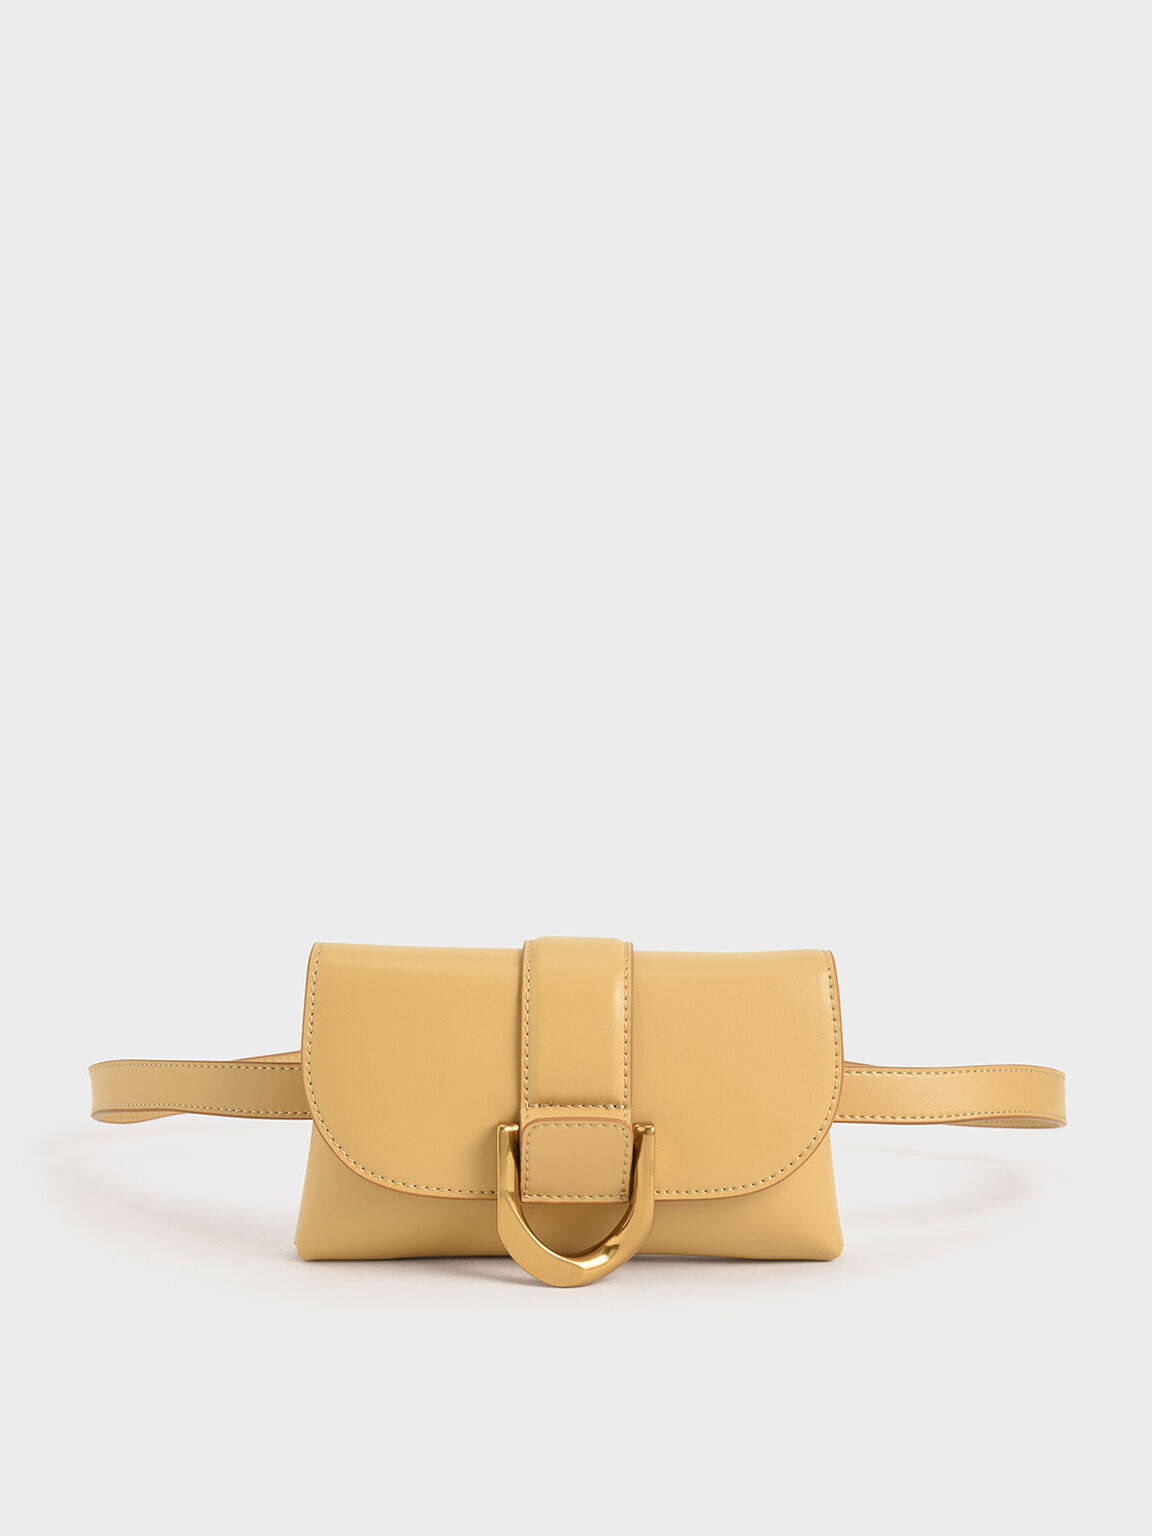 Gabine 兩用腰包, 黃色, hi-res